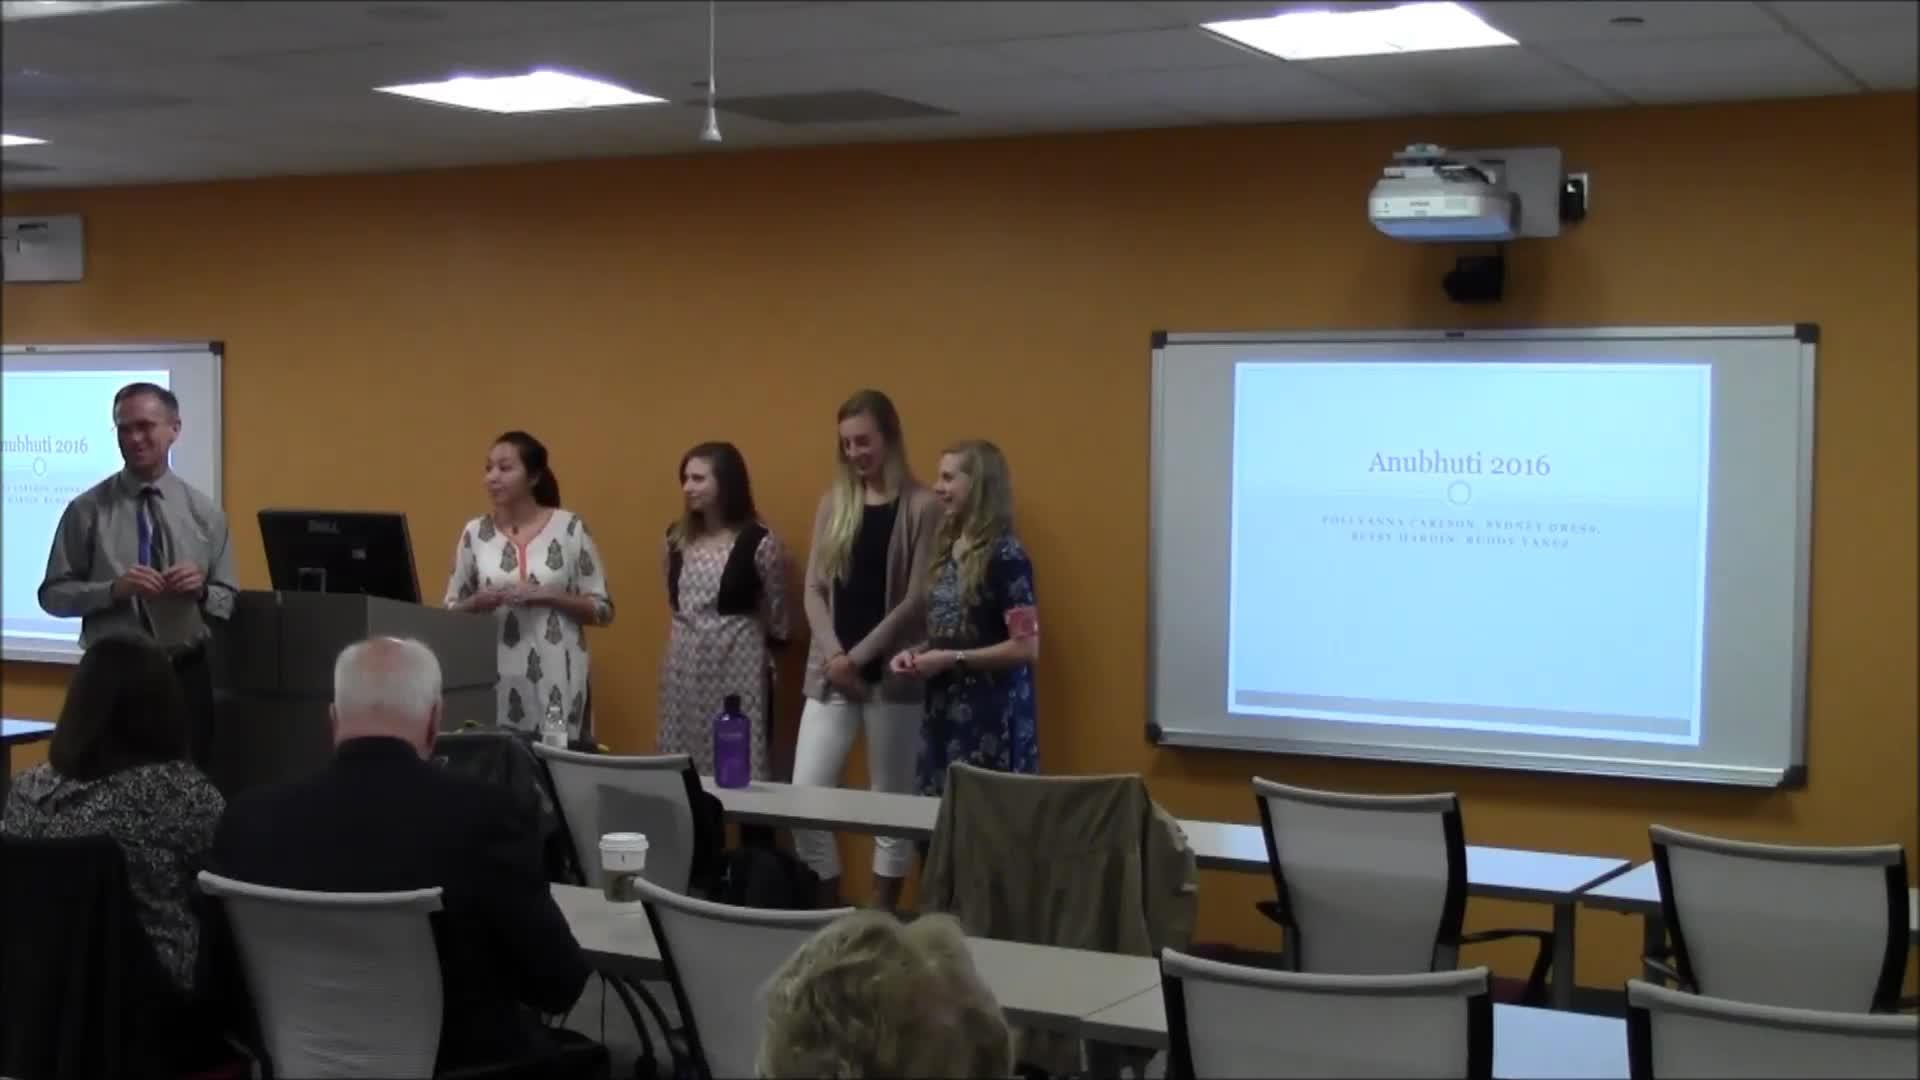 Anubhuti Student Presentation